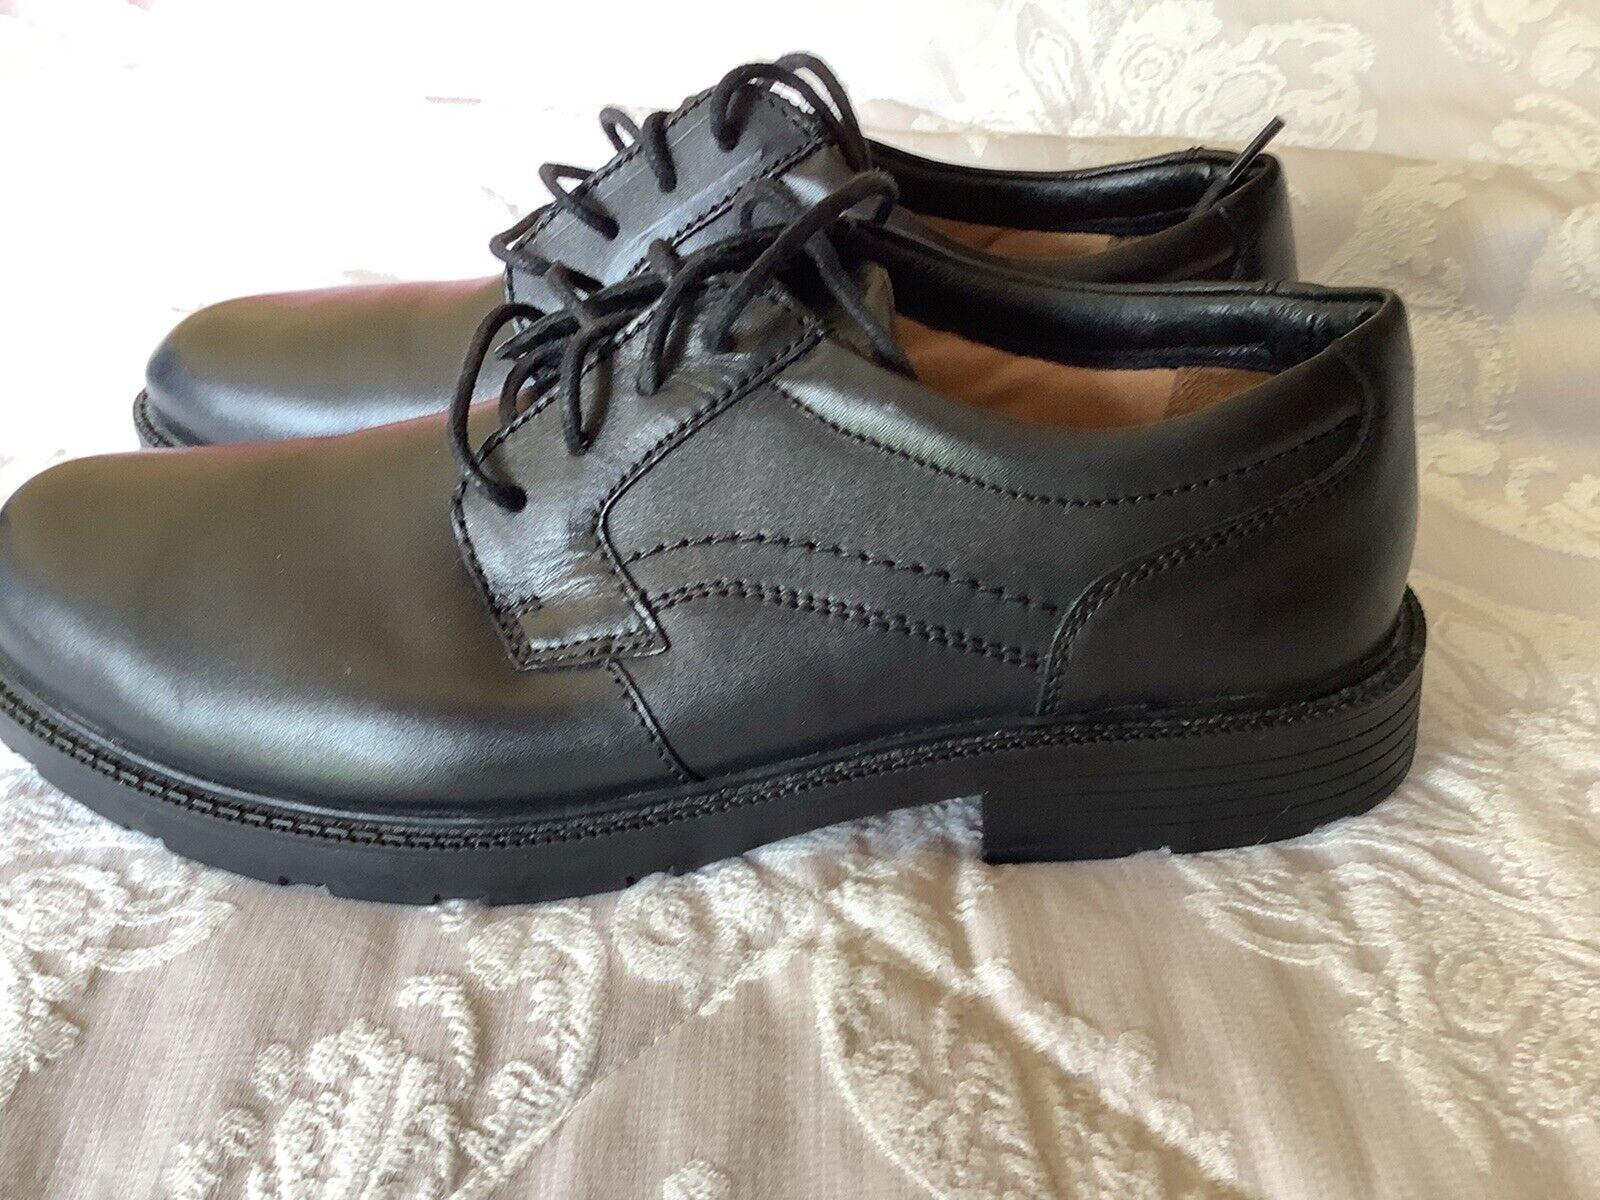 Clarks Sturdy Mens Black Leather Shoes UK Size 9G